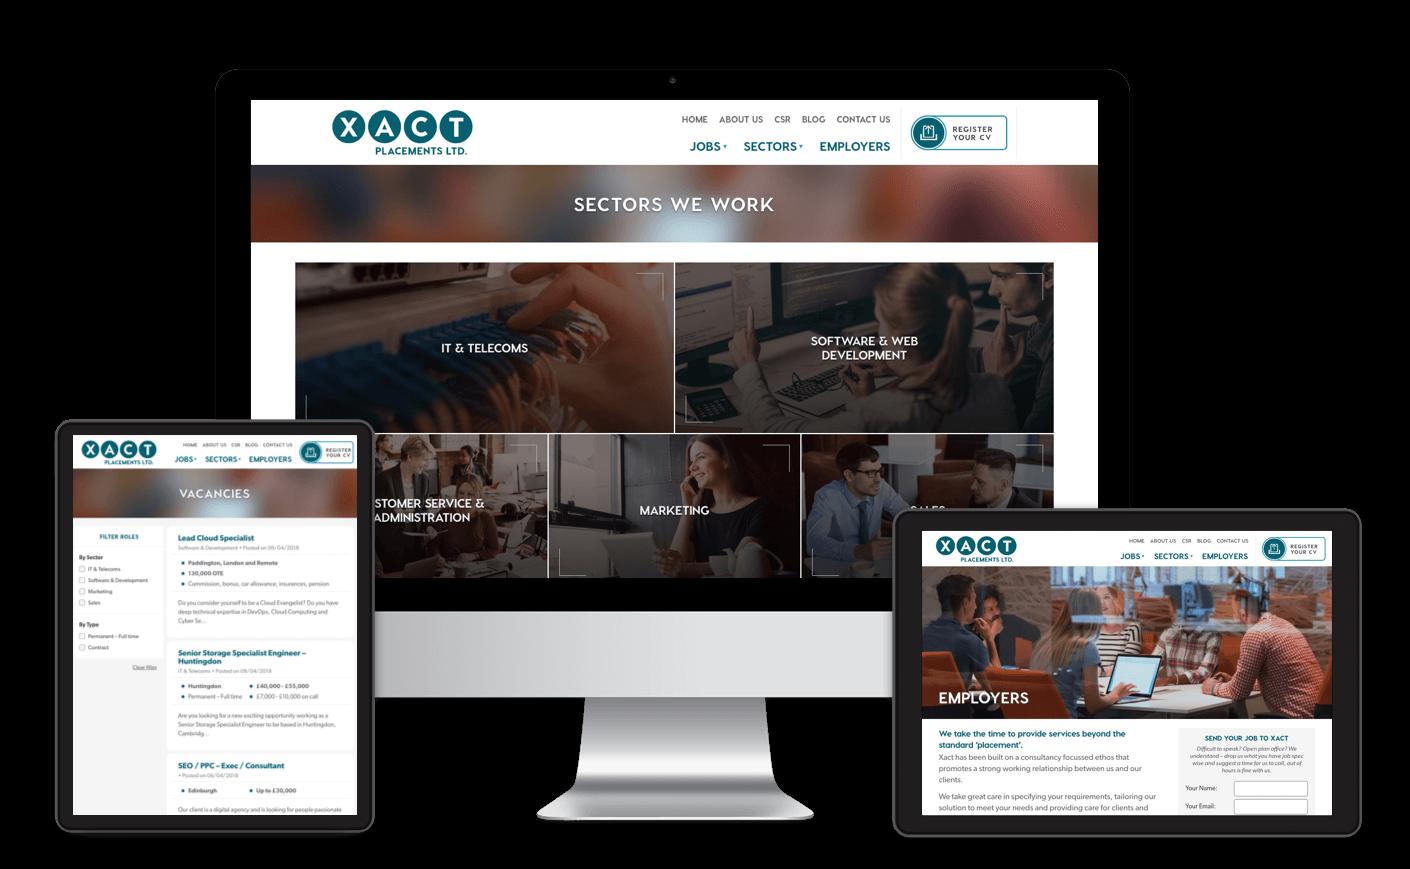 Xact Placements Ltd responsive web design and development